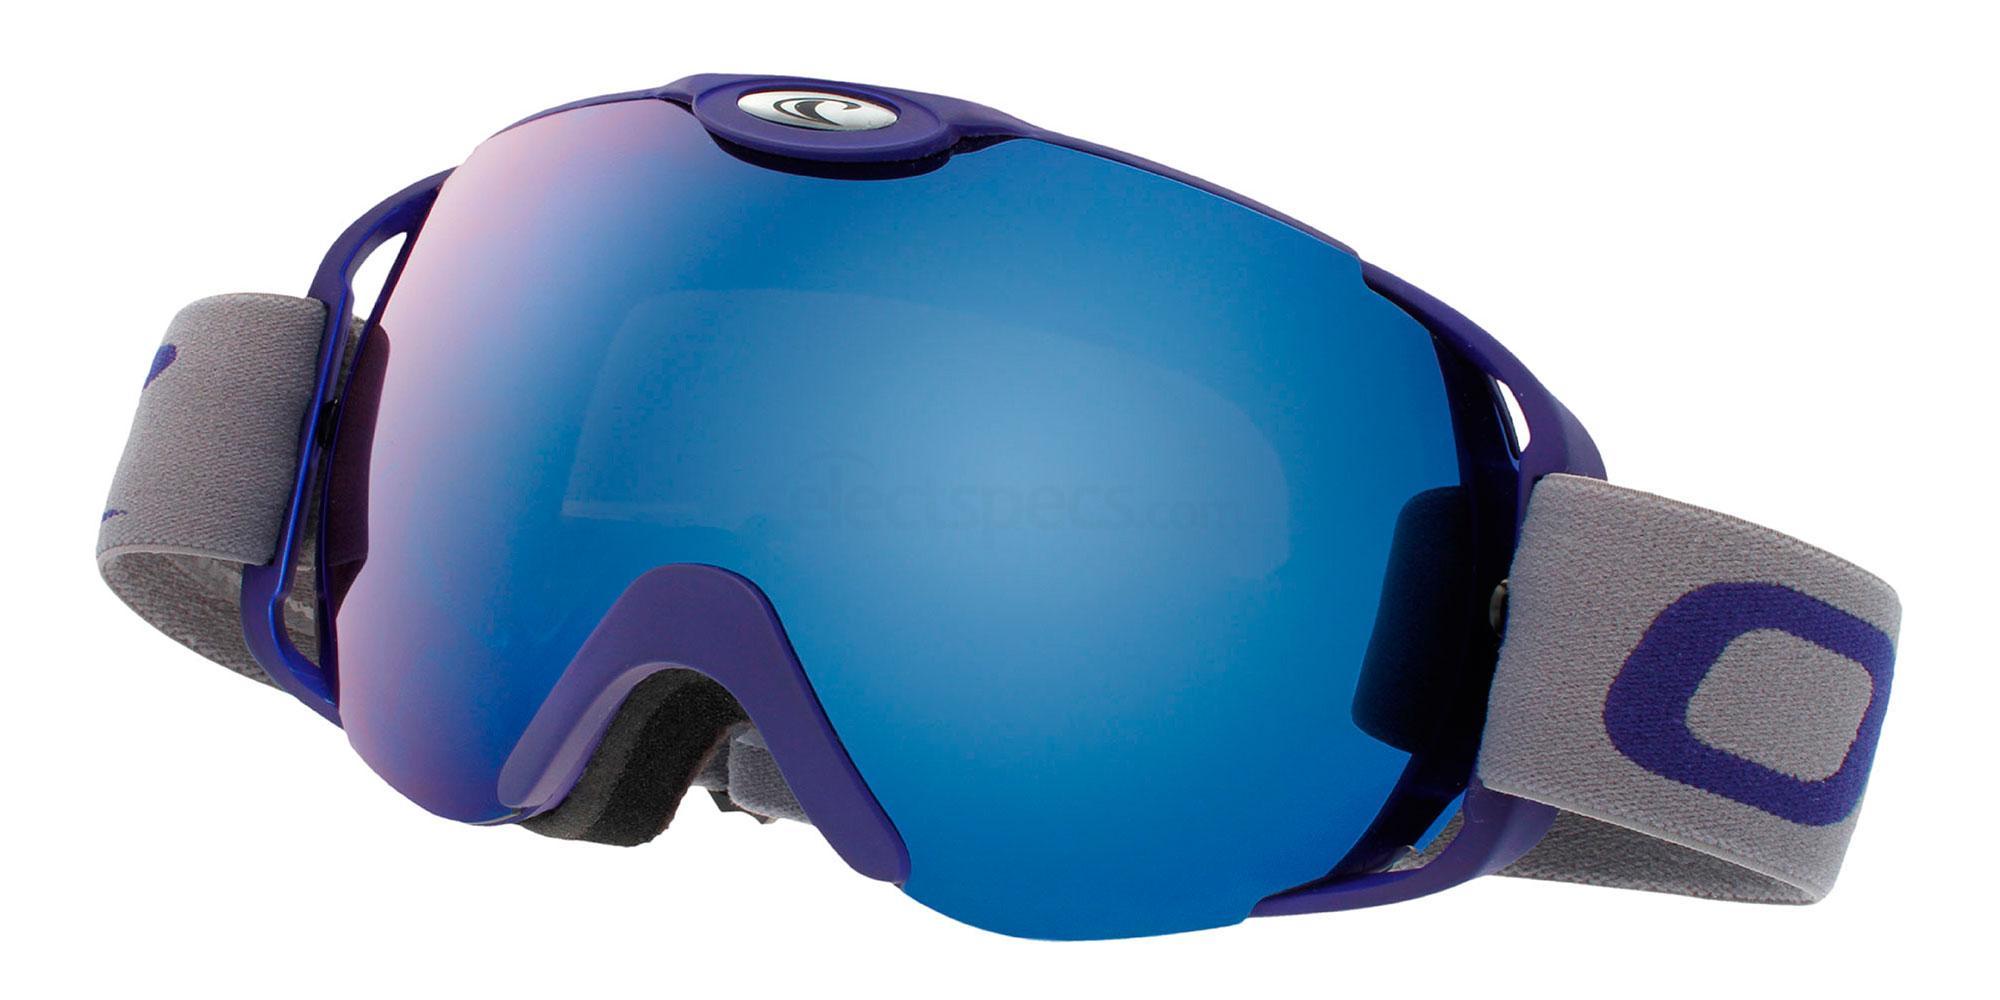 660602 HORIZON (Spherical Lens) Goggles, O'Neill